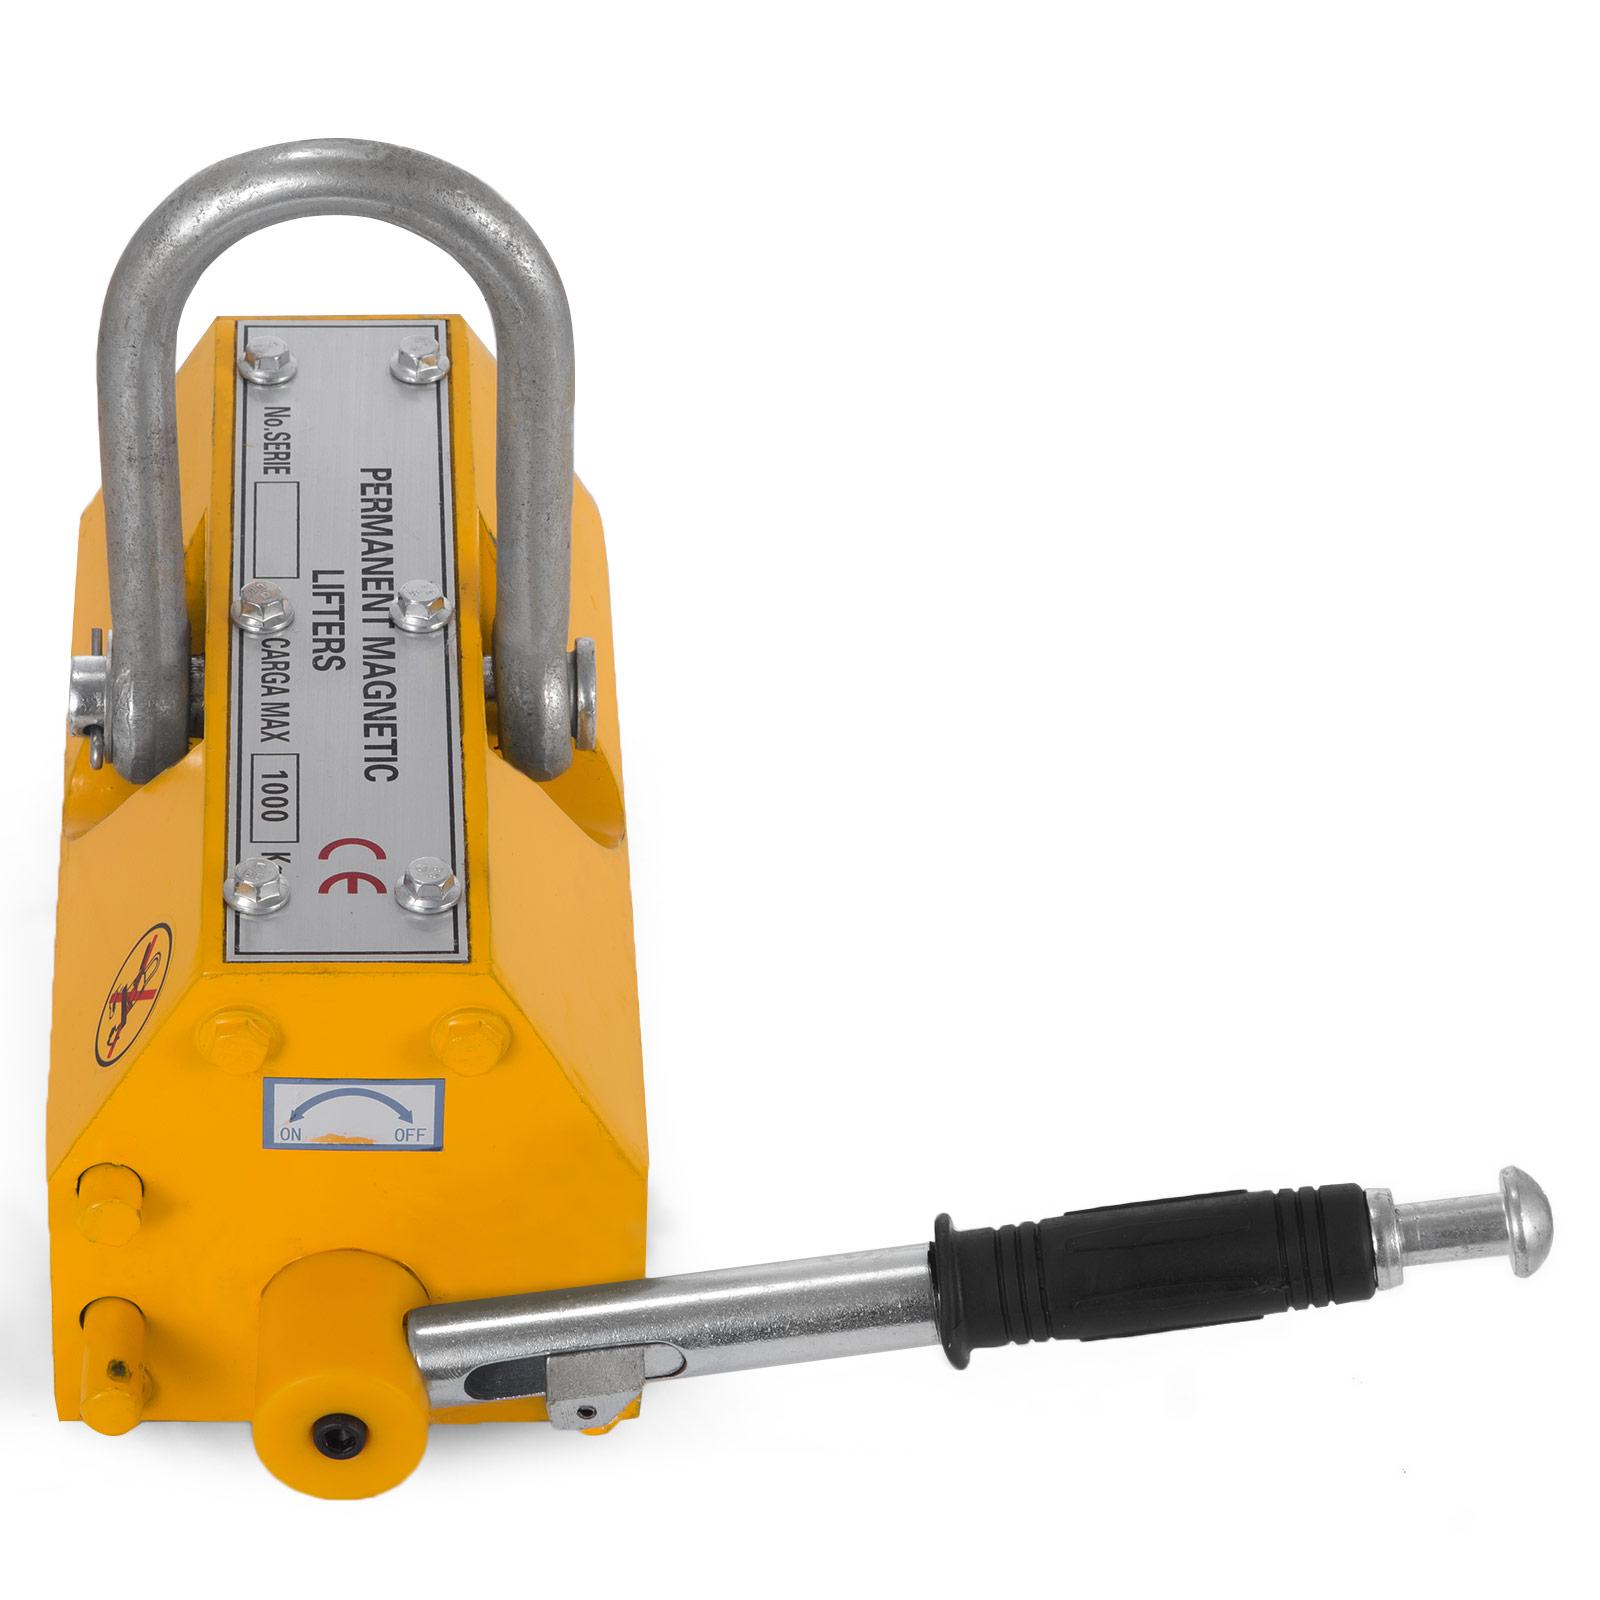 100-300-600-1000KG-Steel-Magnetic-Lifter-Heavy-Duty-Crane-Hoist-Lifting-Magnet miniature 63